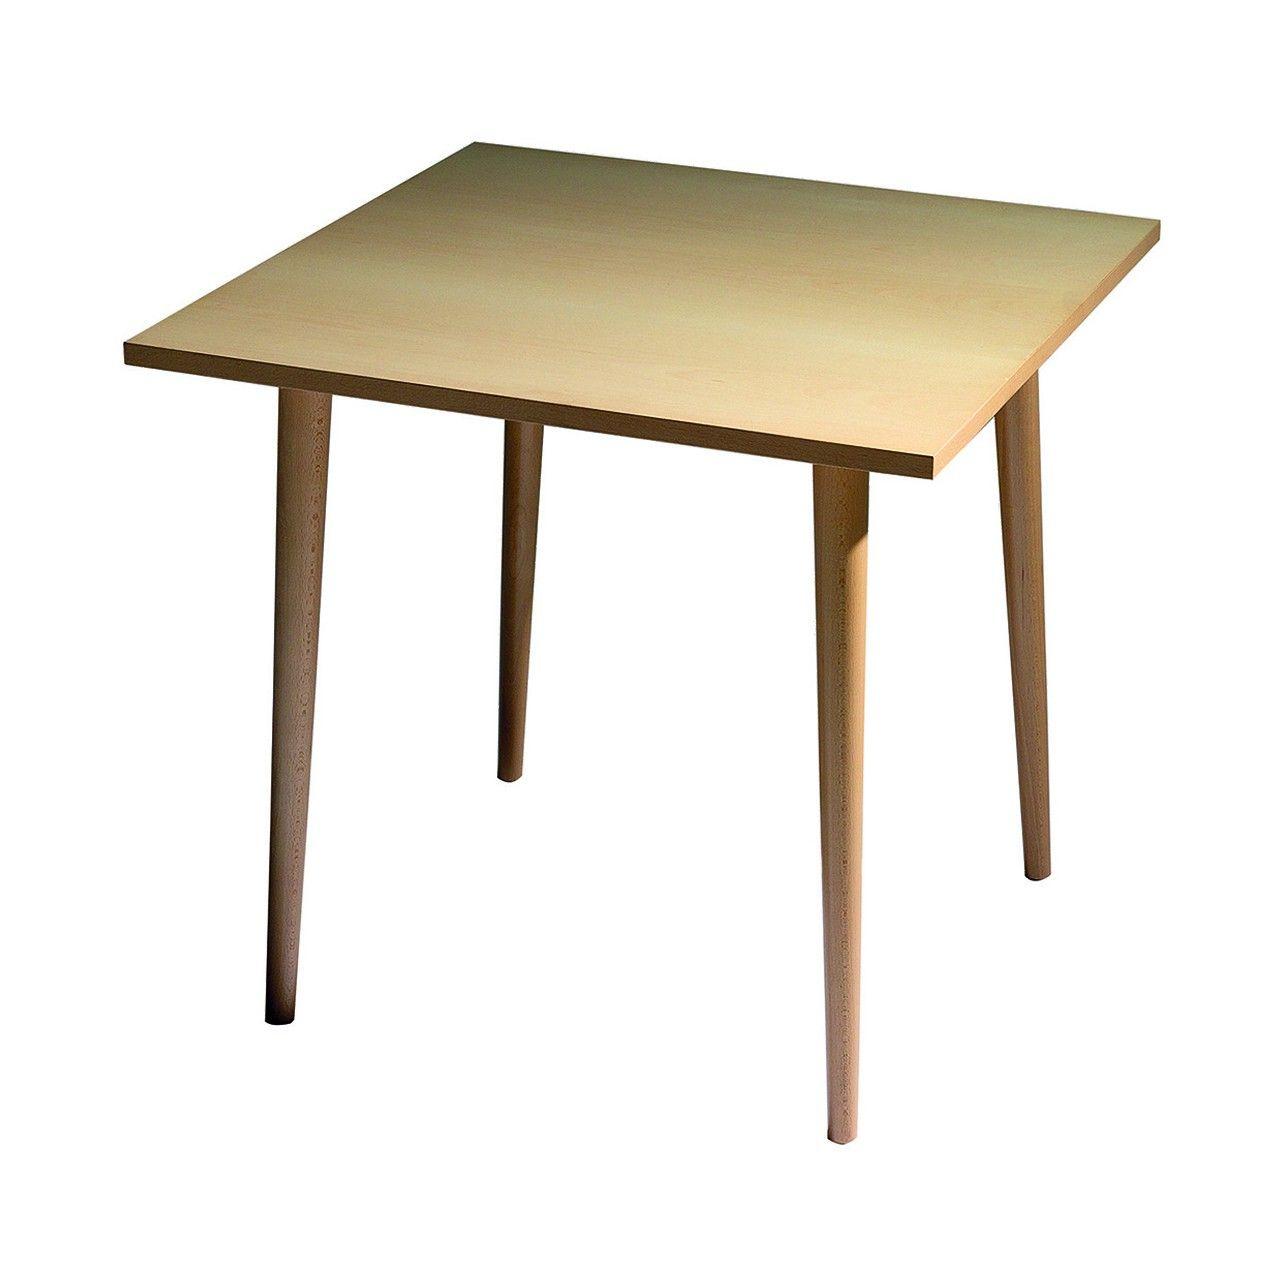 Mesa de madera cuadrada de 4 patas perfectas para - Mesas de cocina diseno ...